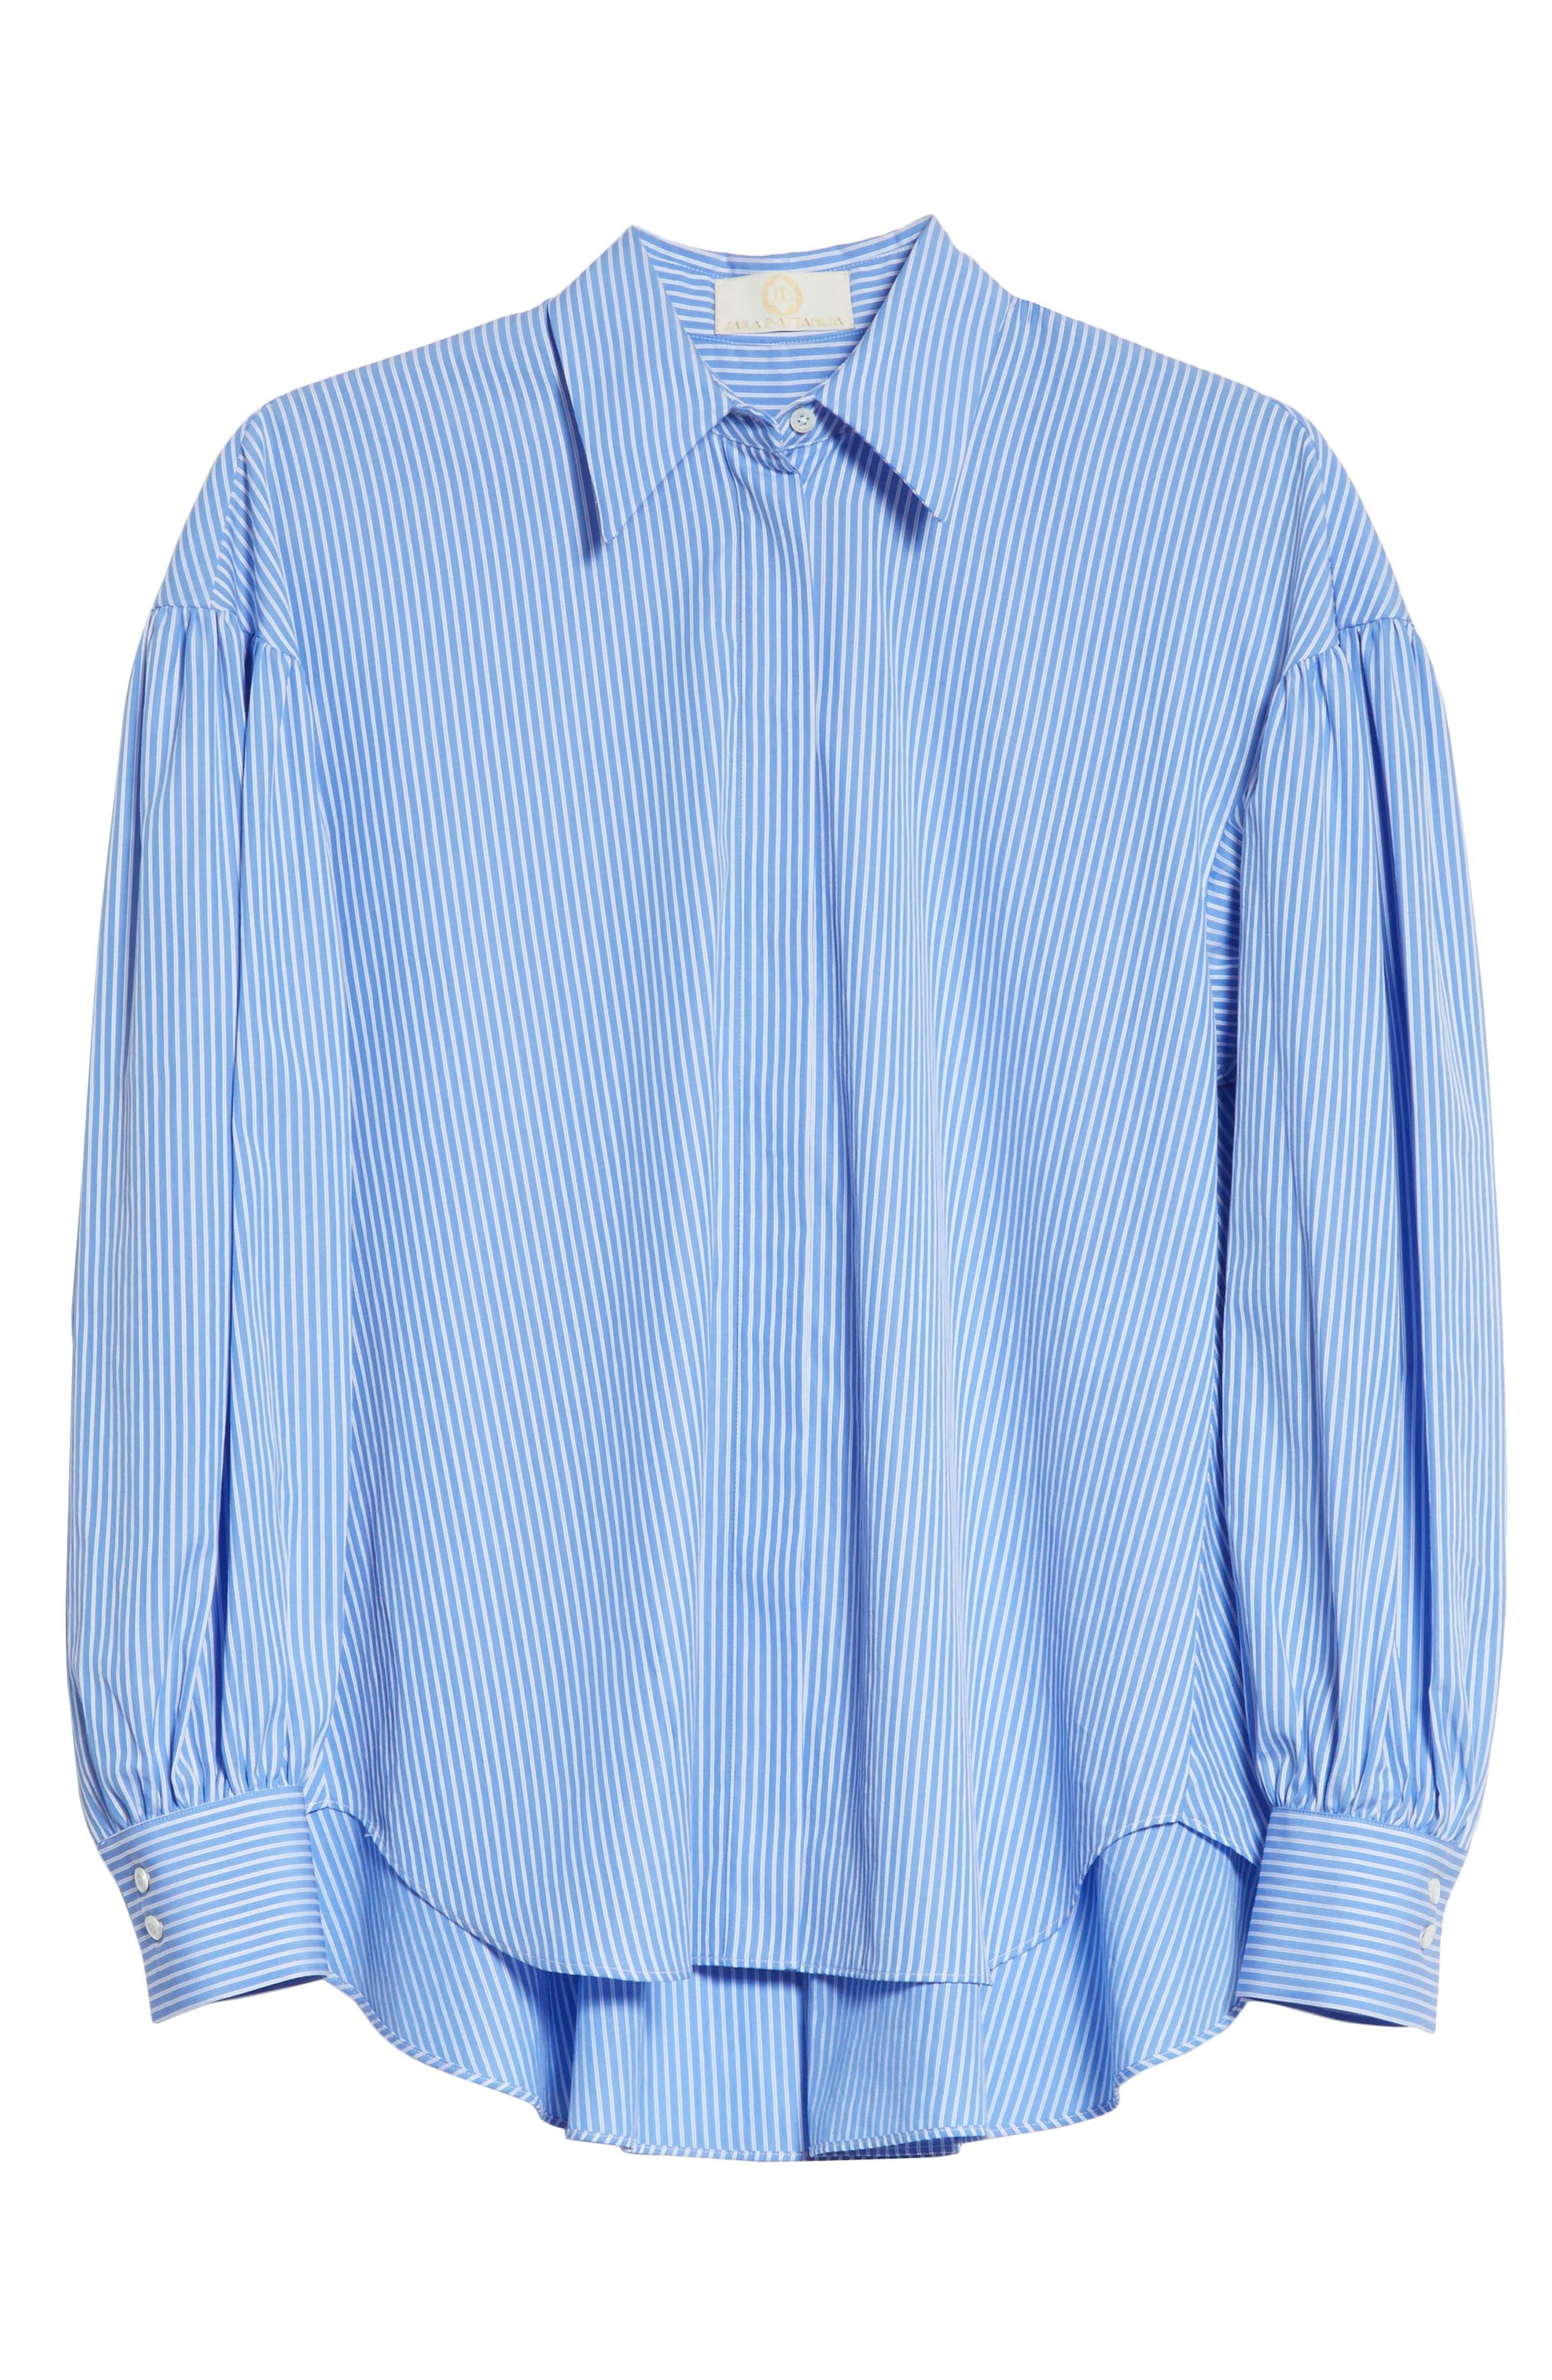 Stripe Puff Sleeve Shirt,                             Alternate thumbnail 6, color,                             Blue Stripe